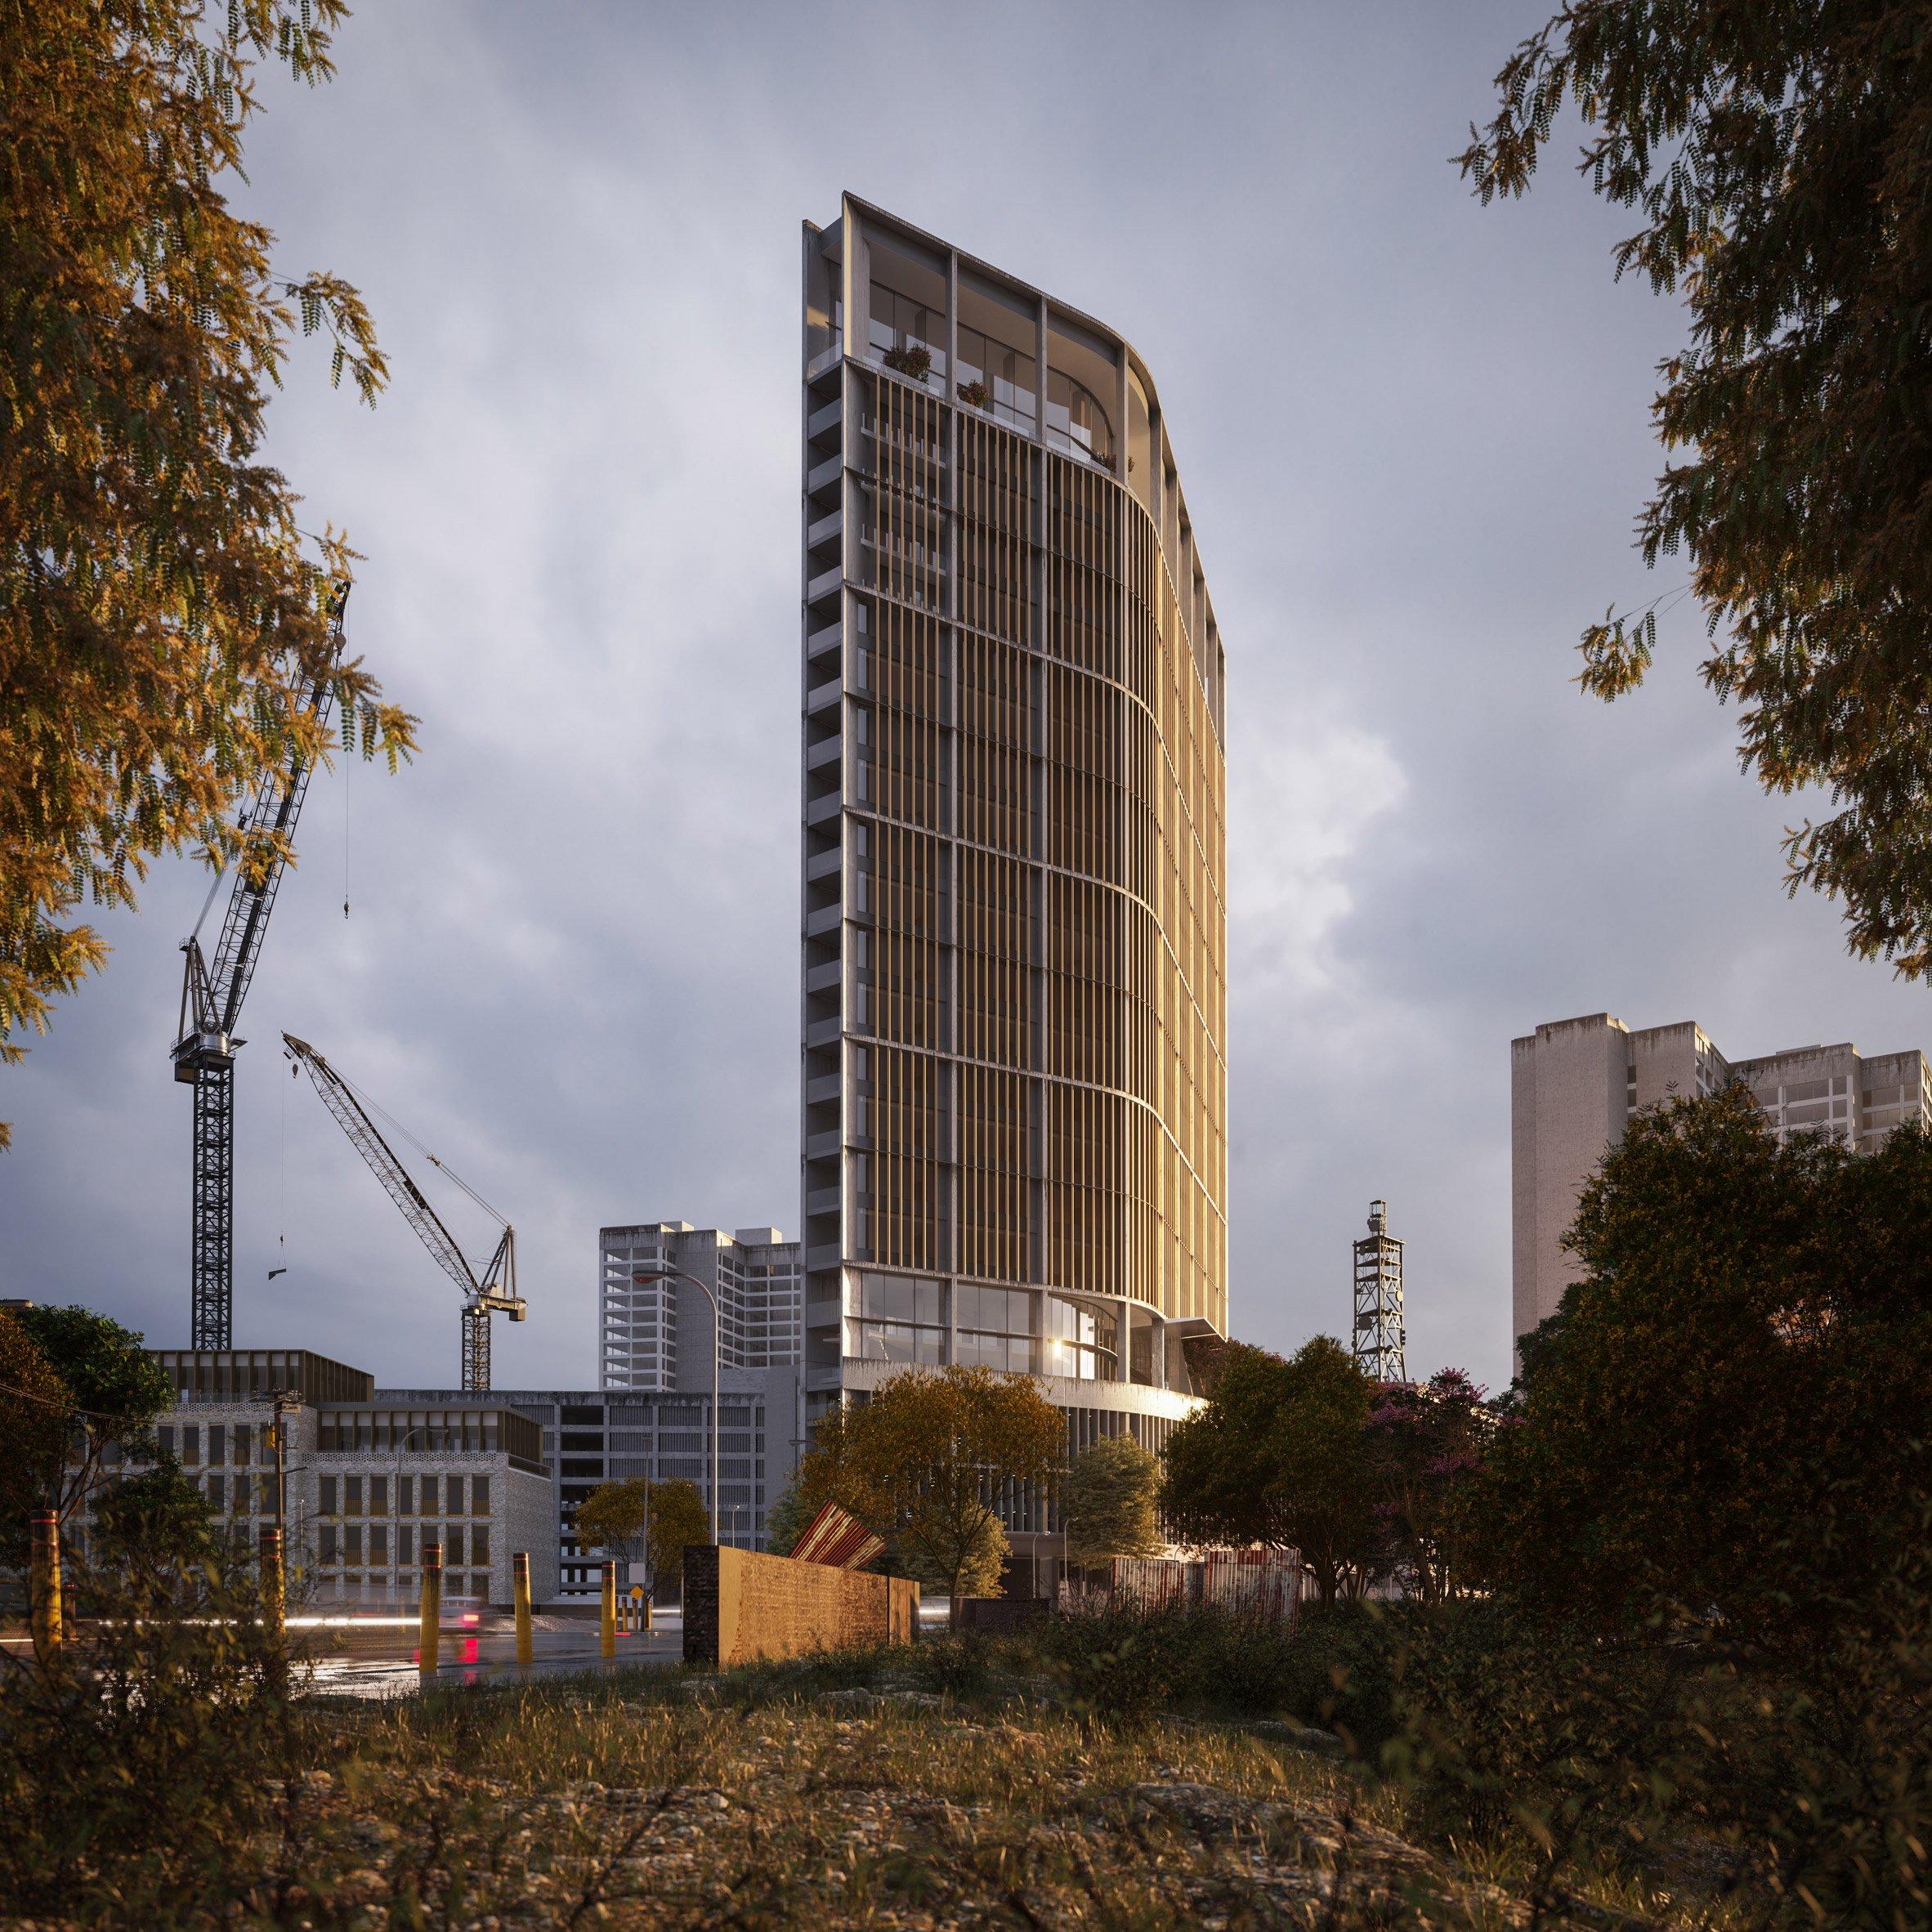 alternative render of apartment building in Kenya